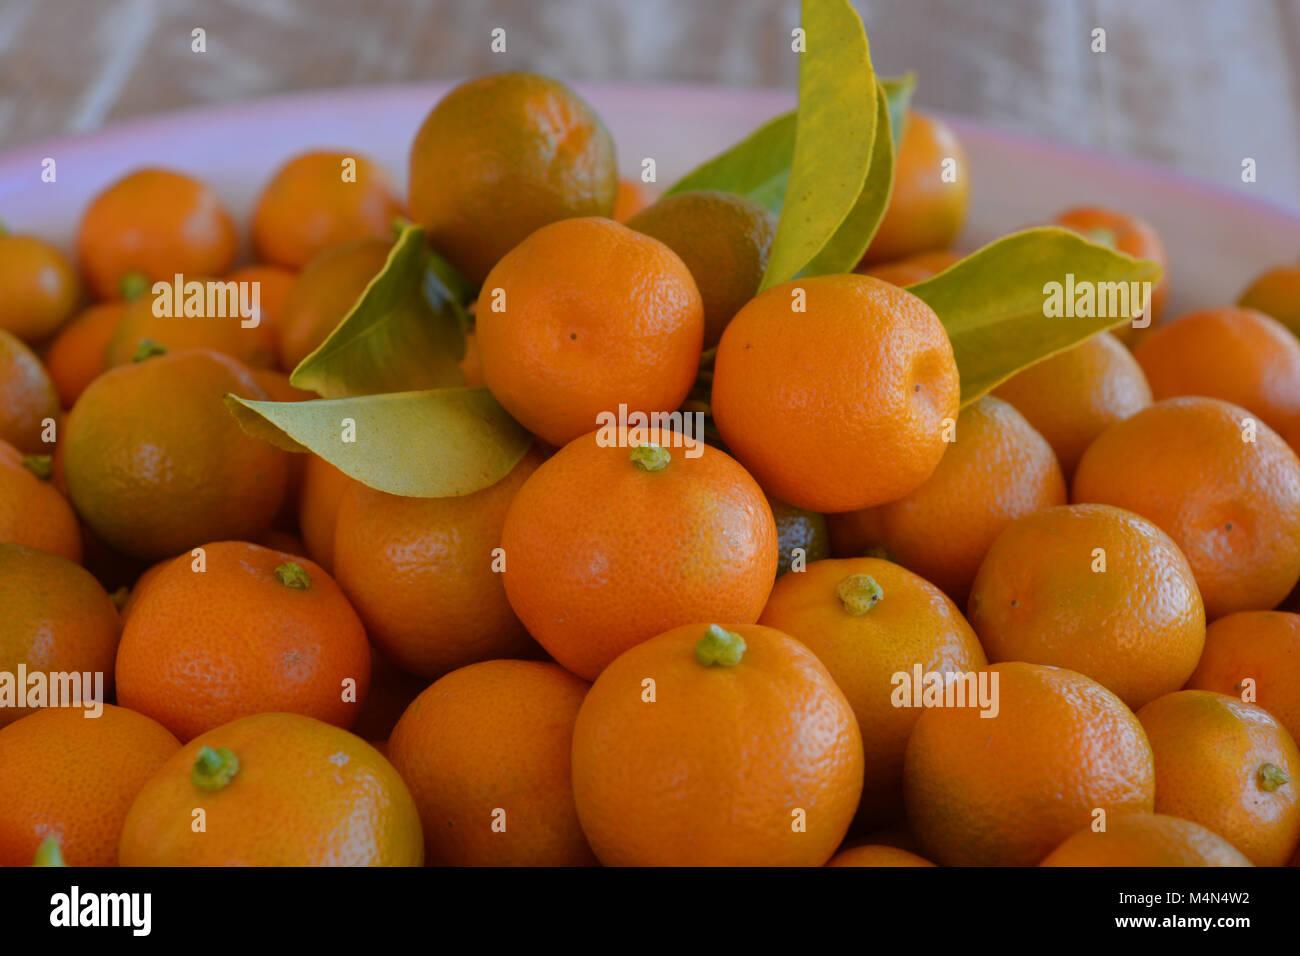 S E C Stock Photos Images Alamy Limau Kasturi Original New Also Known As Kalamansi Or Calamondin Scientific Name Citrus Microcarpa